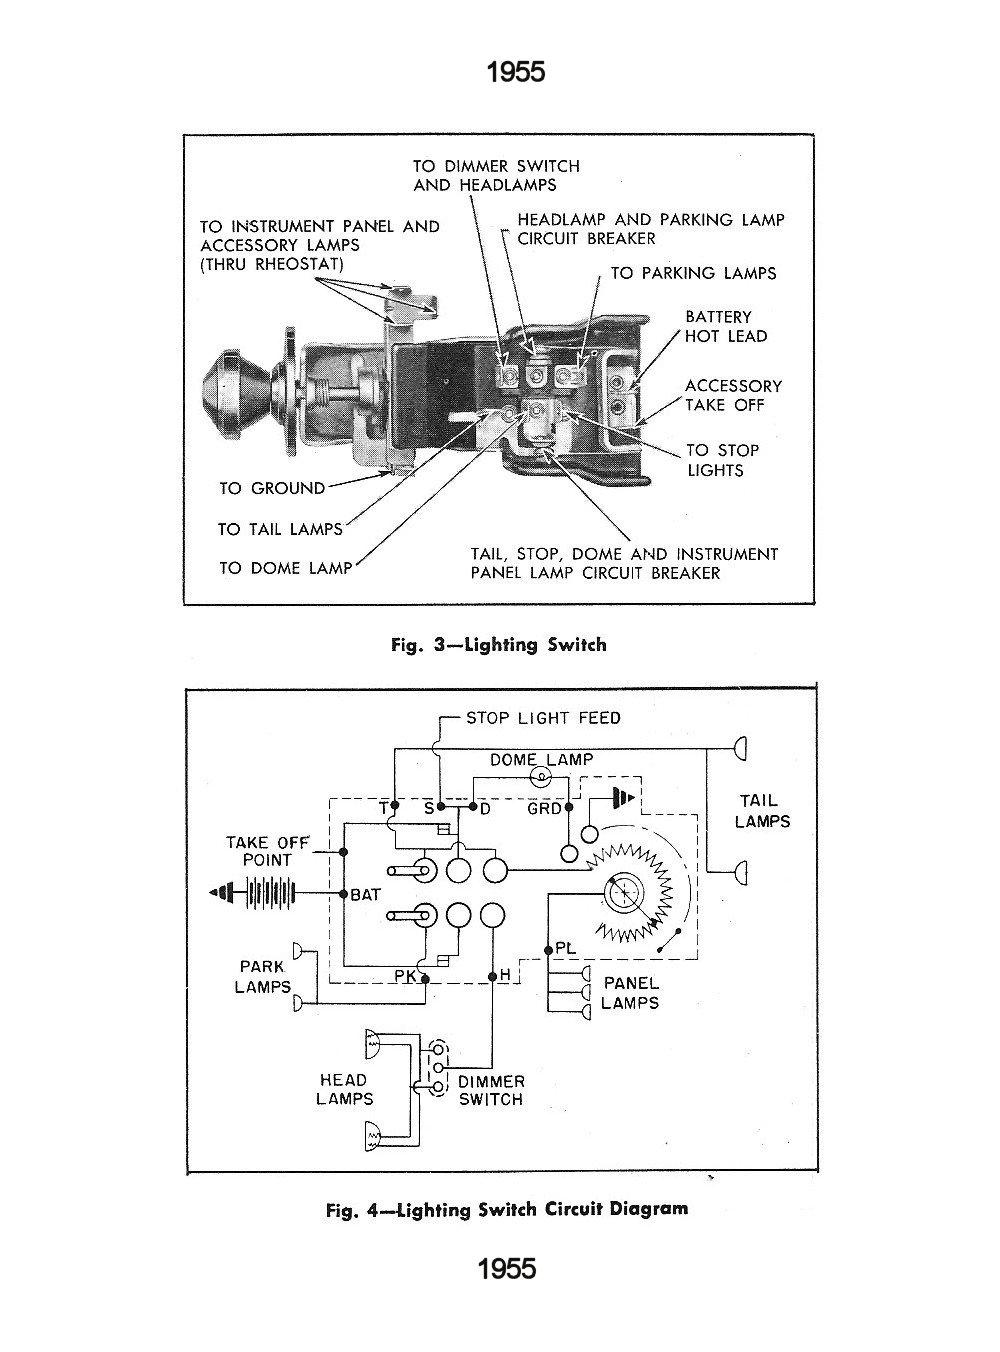 Strange 1984 Chevy C10 Fuse Box Diagram Basic Electronics Wiring Diagram Wiring Cloud Mousmenurrecoveryedborg